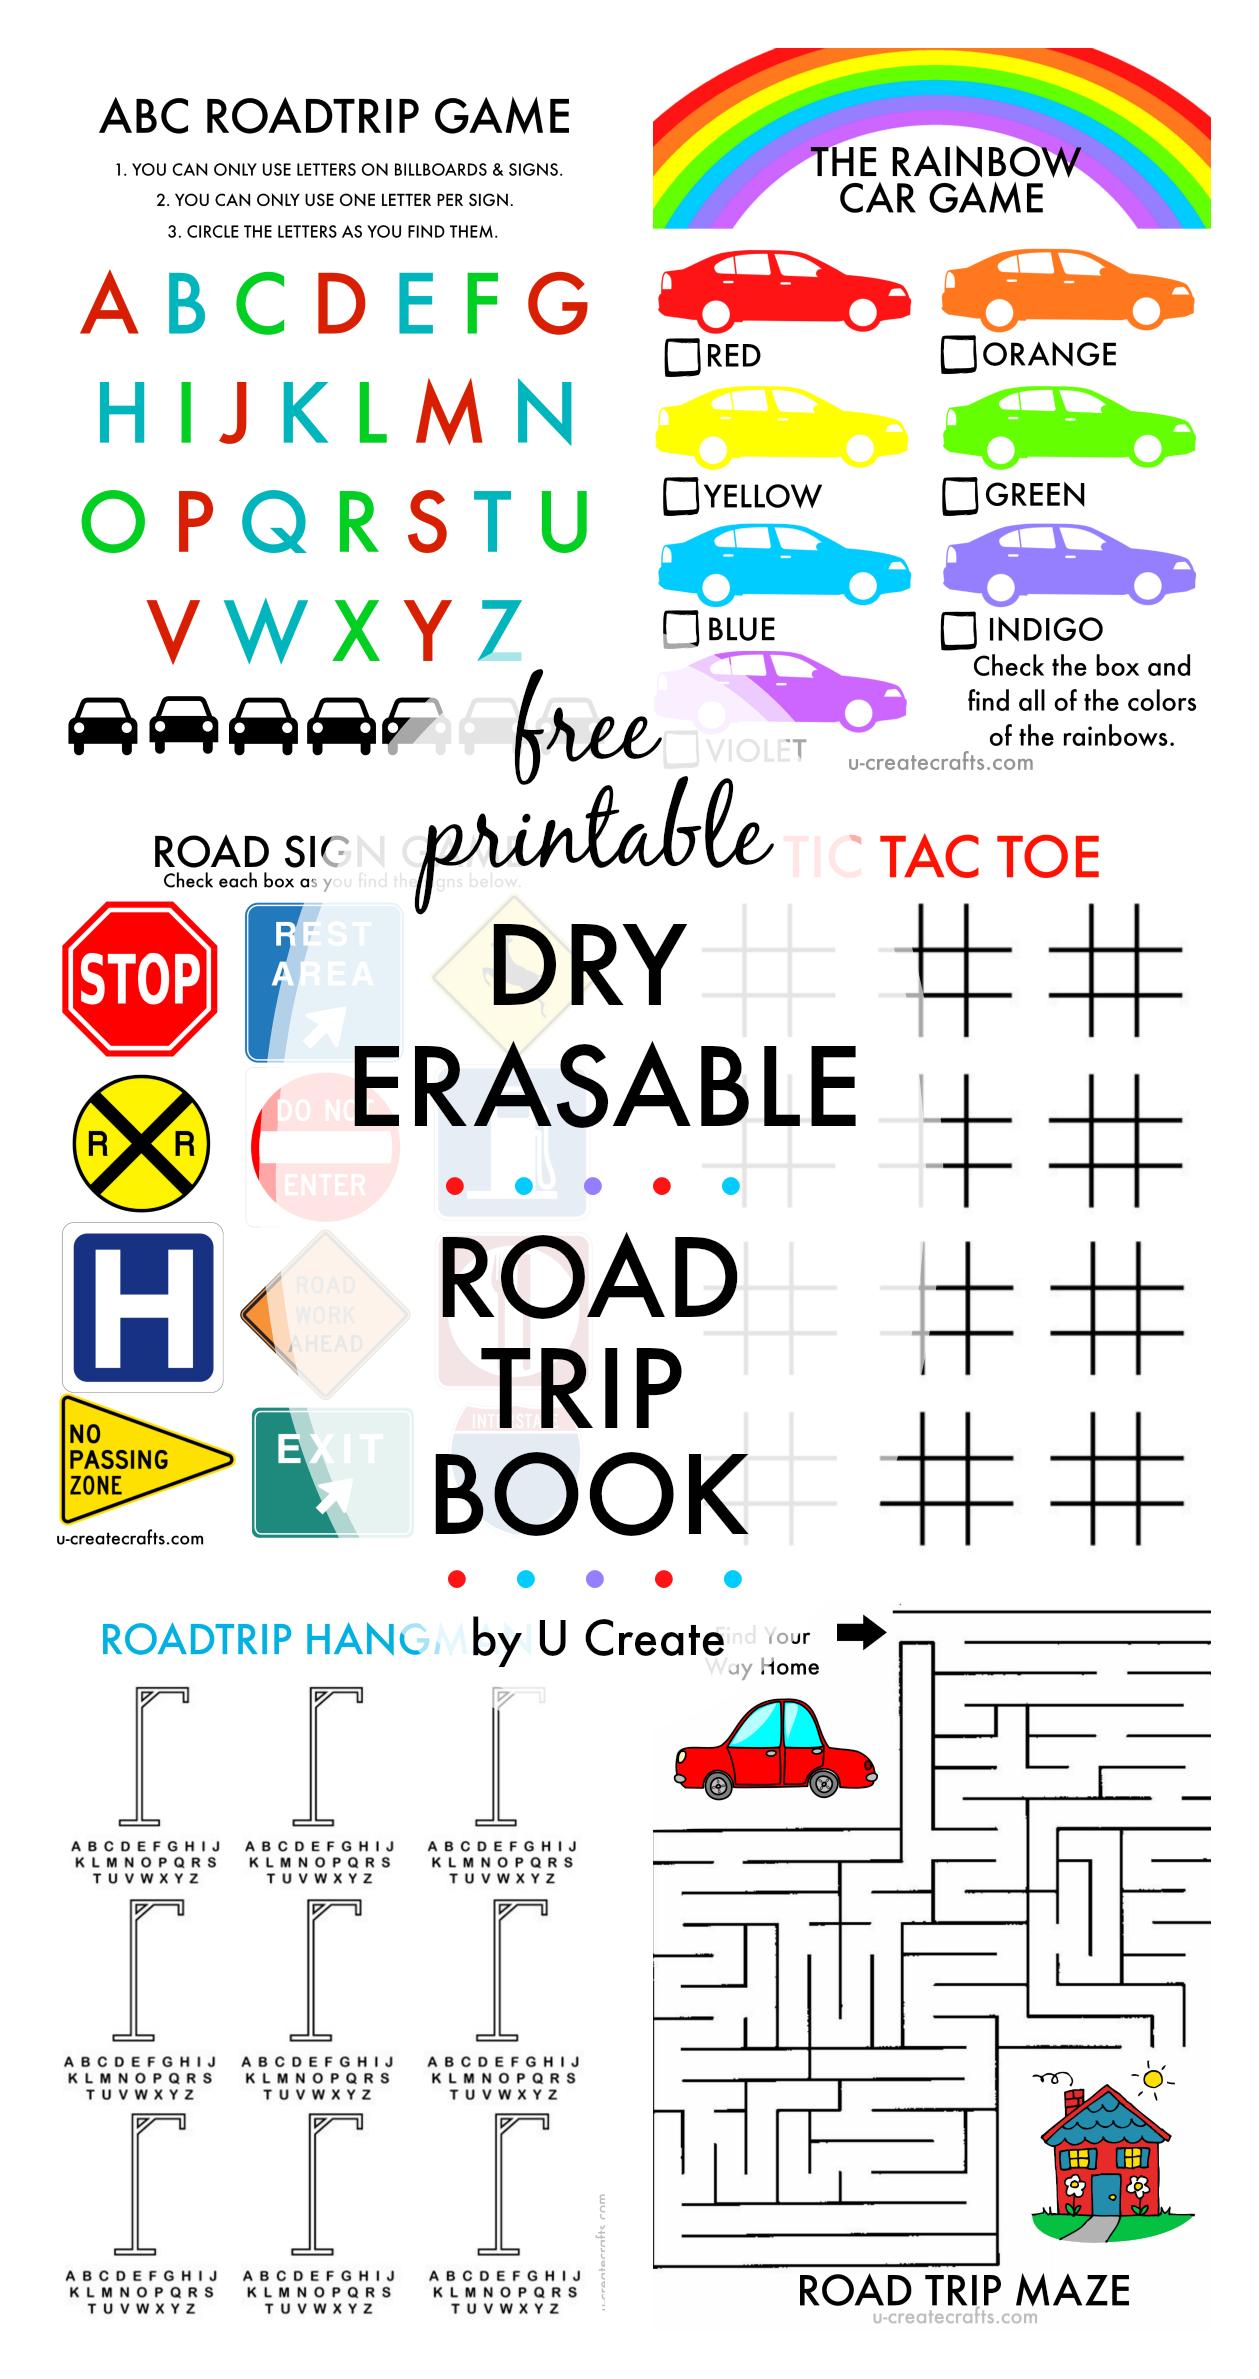 Free Printable Road Trip Book - Free Printable Hangman Game